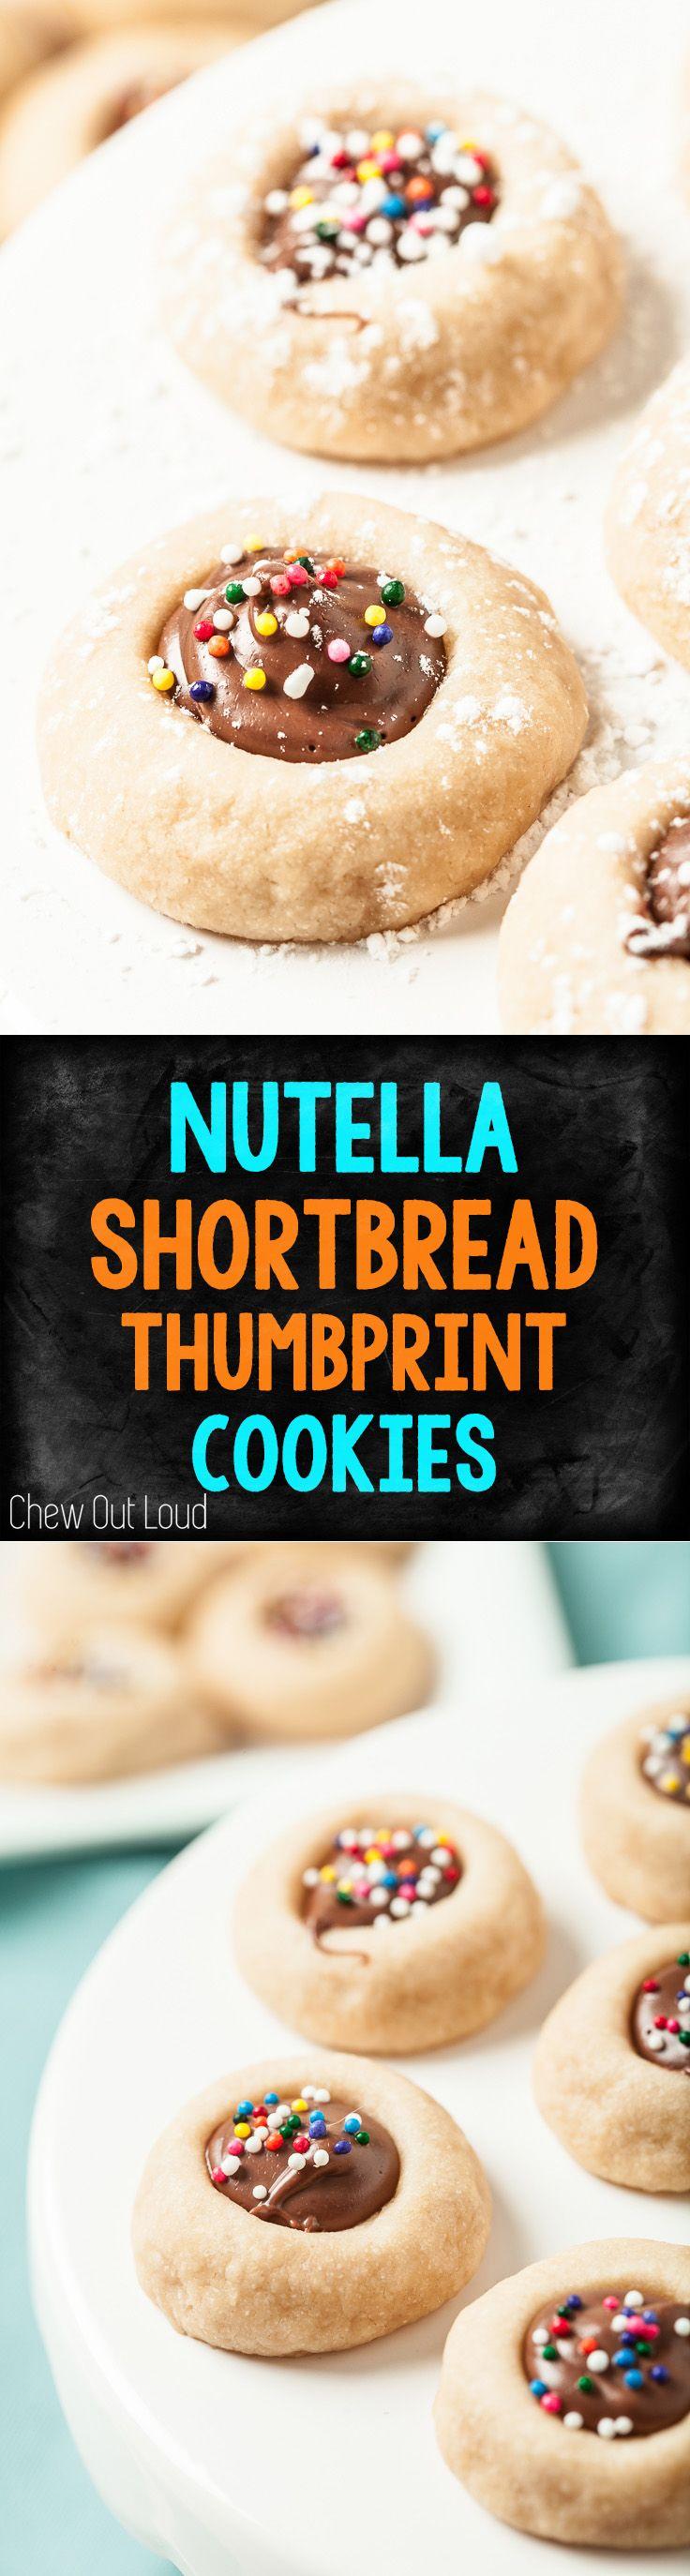 4-Ingredient Nutella Thumbprint Shortbread Cookies! So easy, incredibly delish. #nutella #shortbread #cookies #dessert